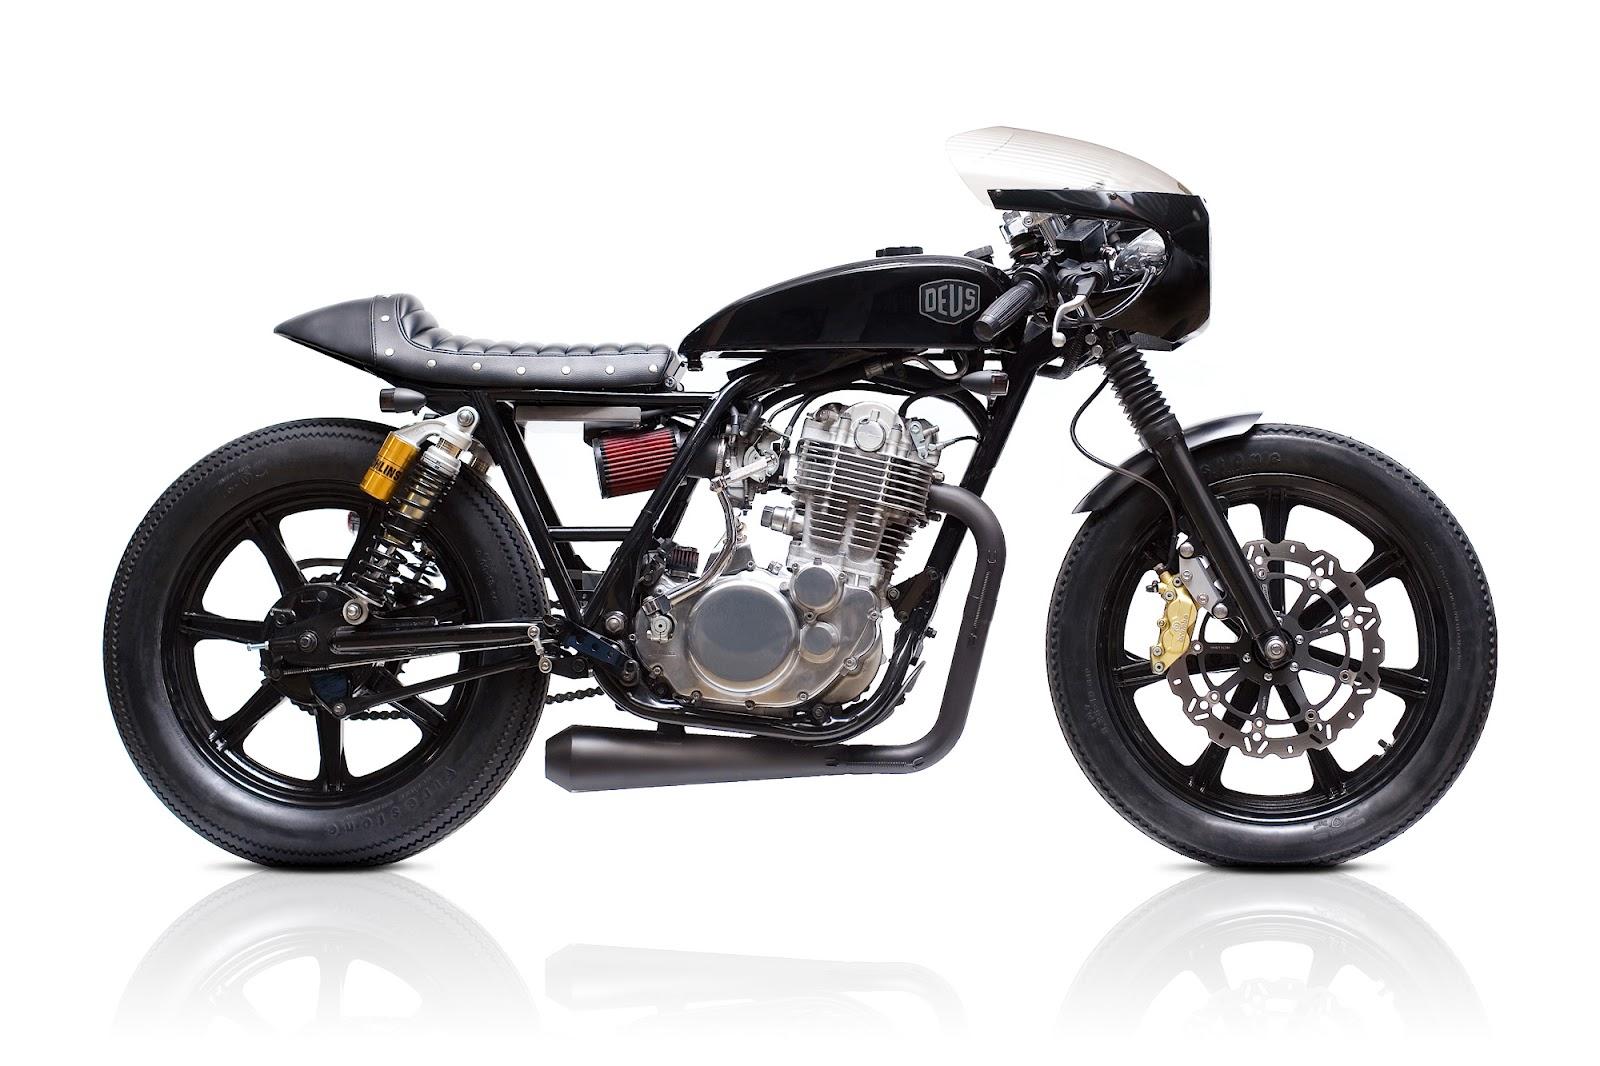 Moto Chinoise Cafe Racer